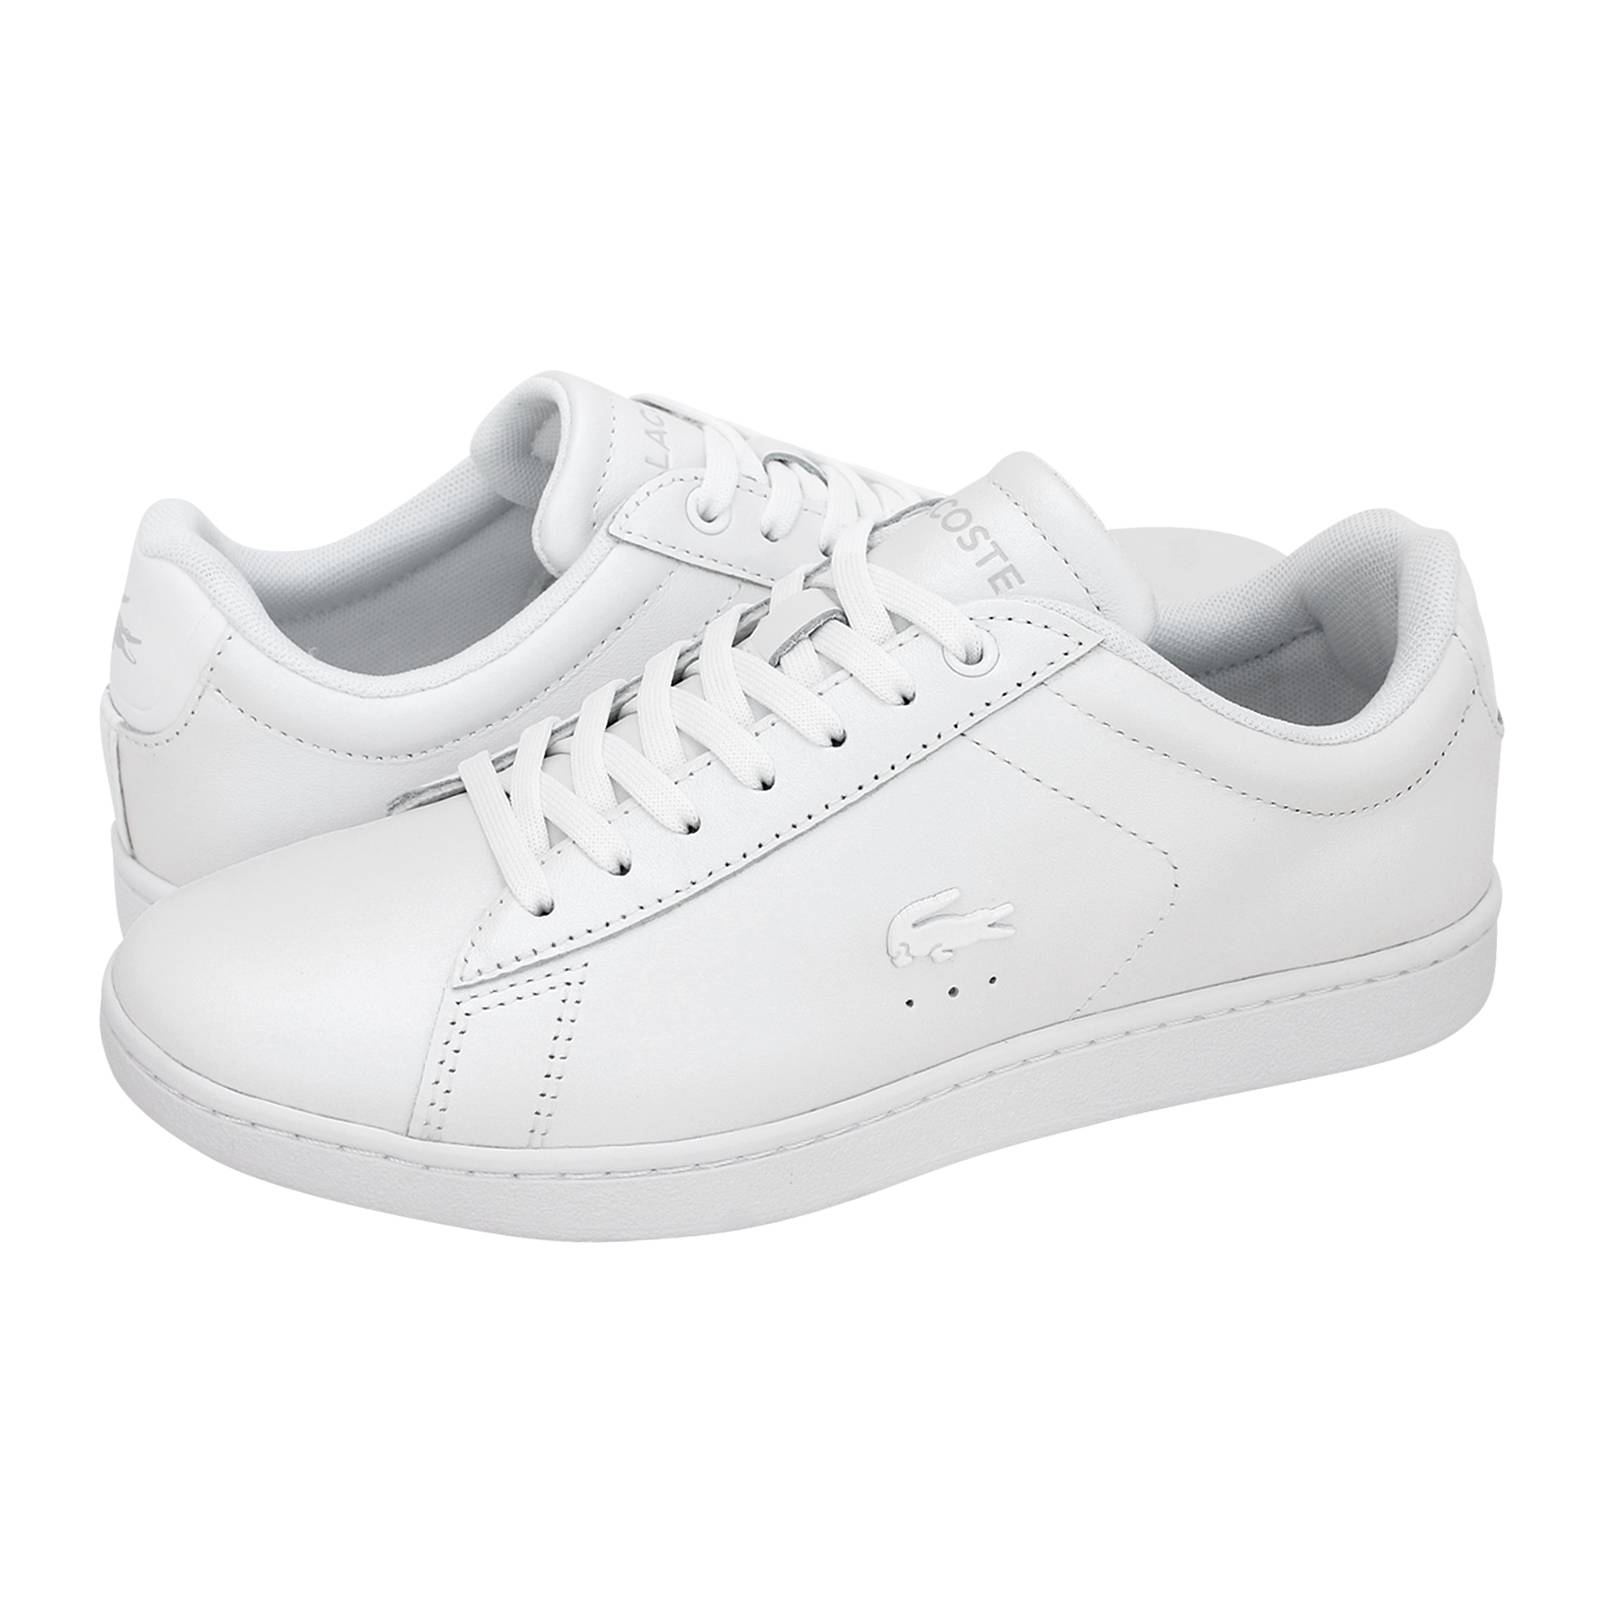 Carnaby Evo - Γυναικεία παπούτσια casual Lacoste από δερμα περλε ... 7da9d8aaafb